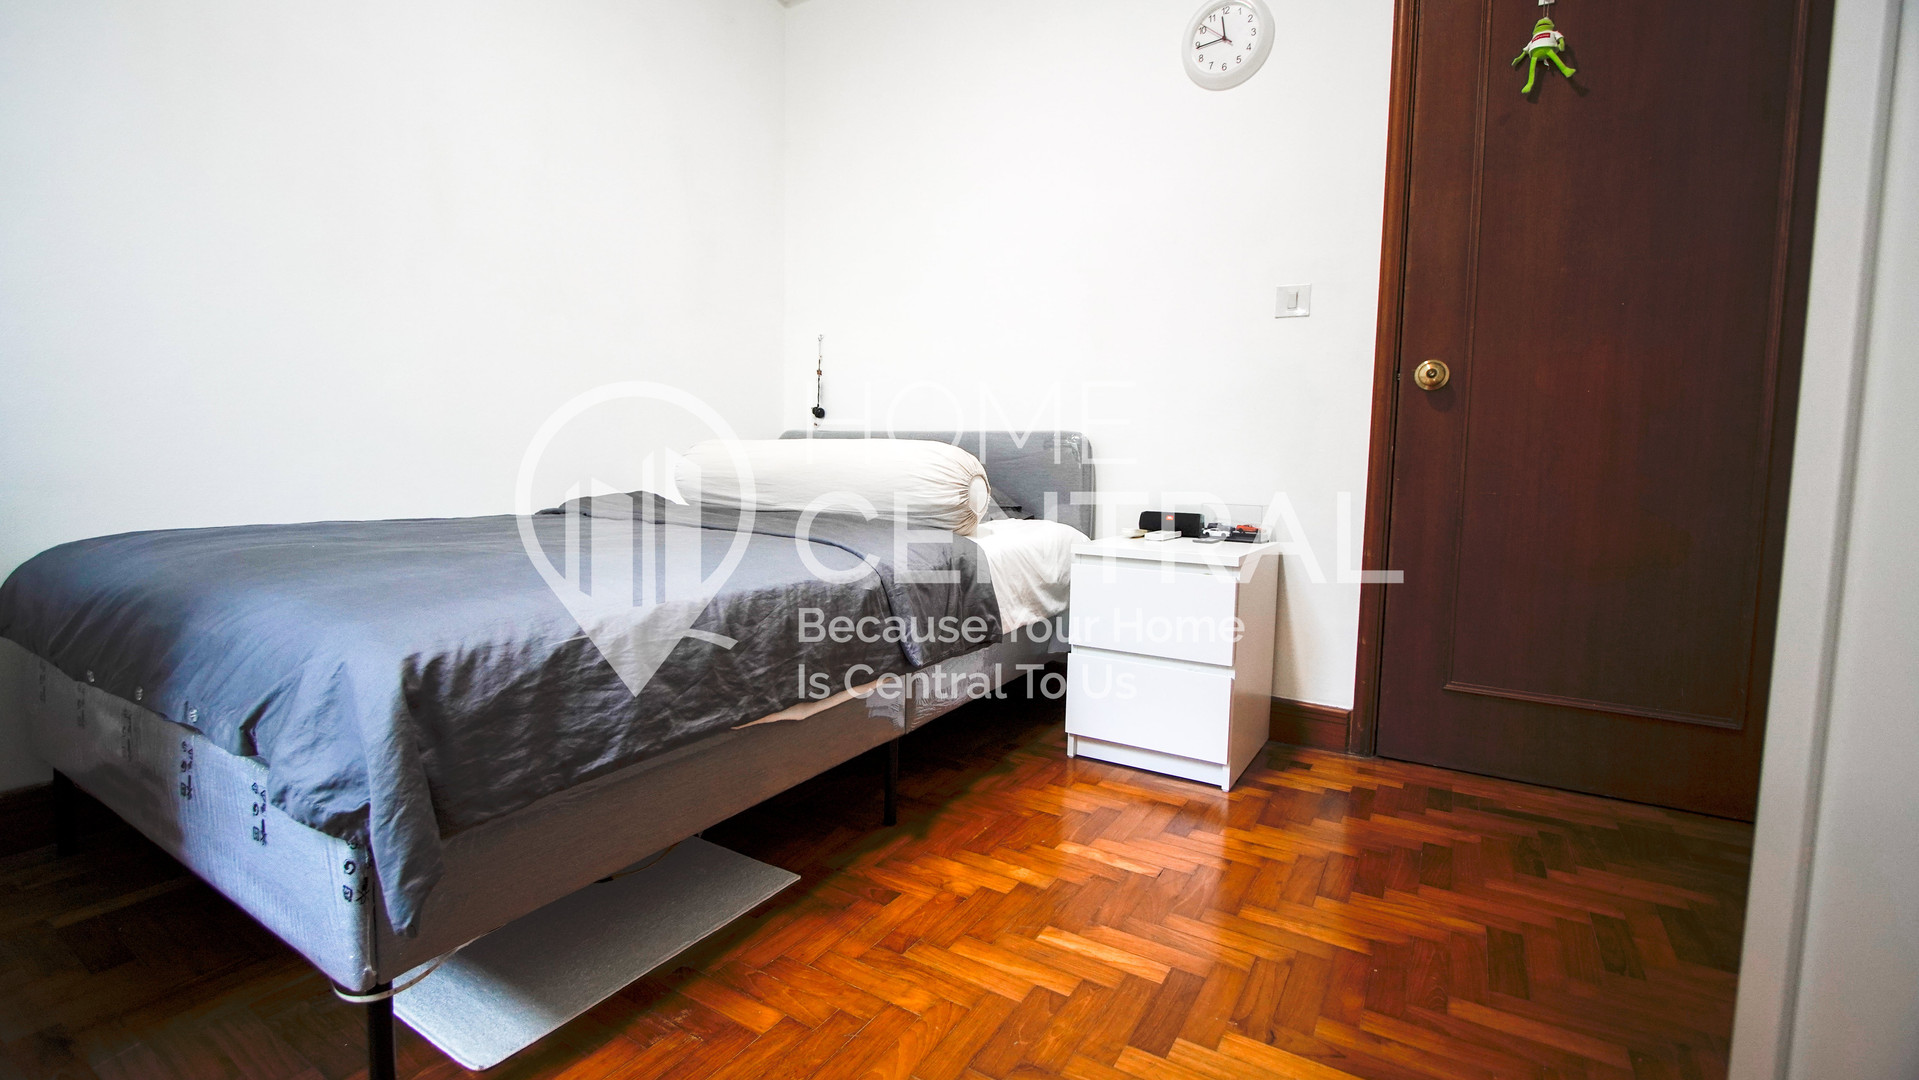 10 Bedroom 1-1 DSC02338-HDR-min.jpg